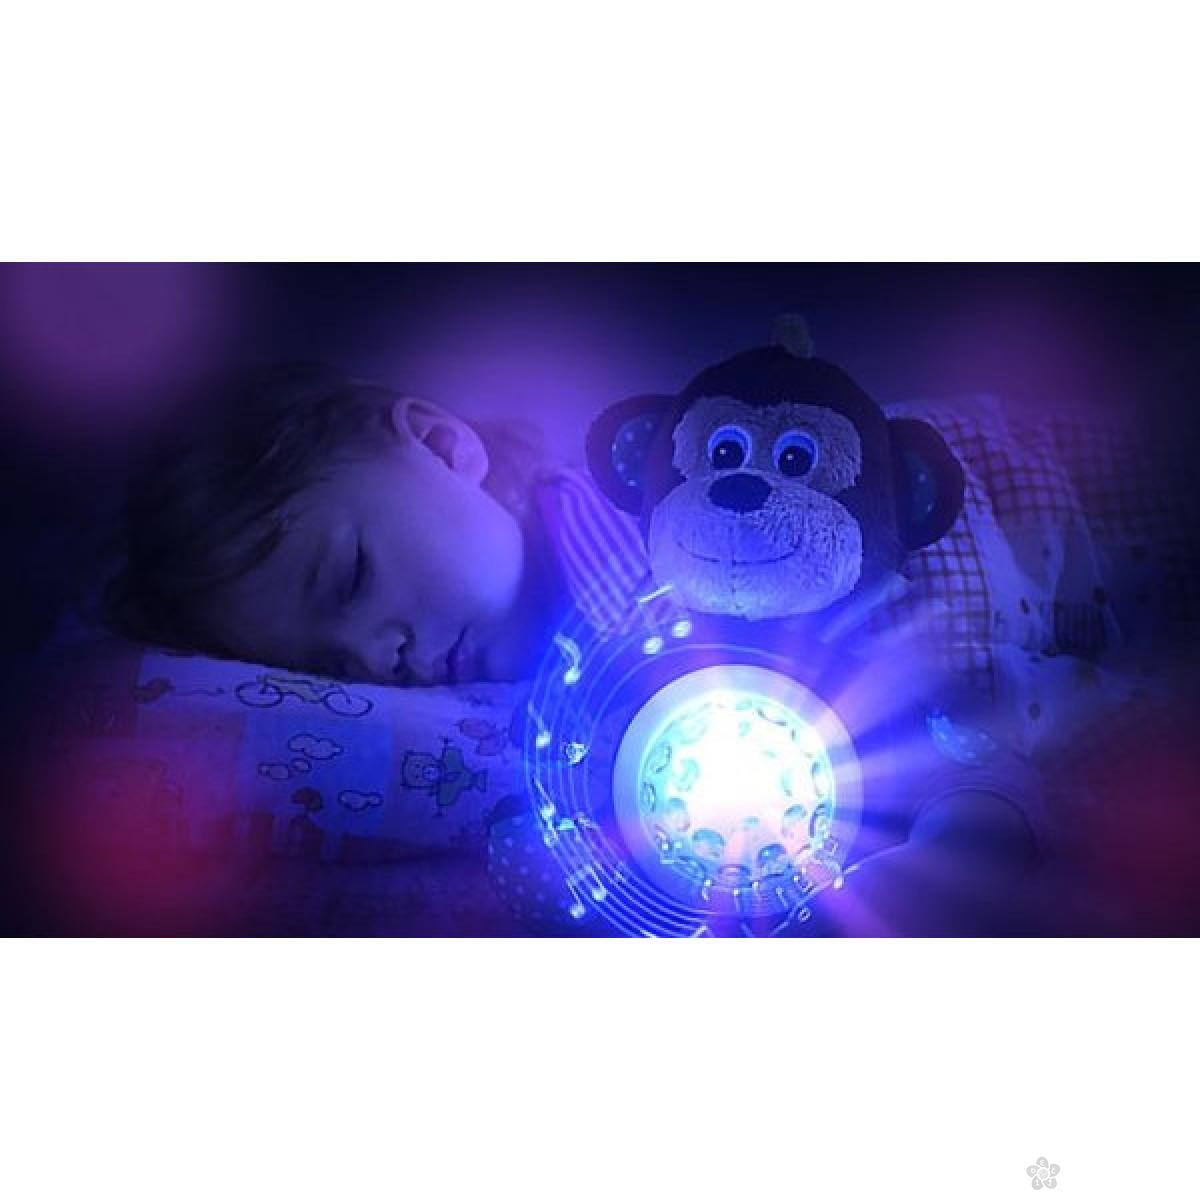 Noćno svetlo Zvezdani ljubimci (Starlight pets) – Lavić , TS51908